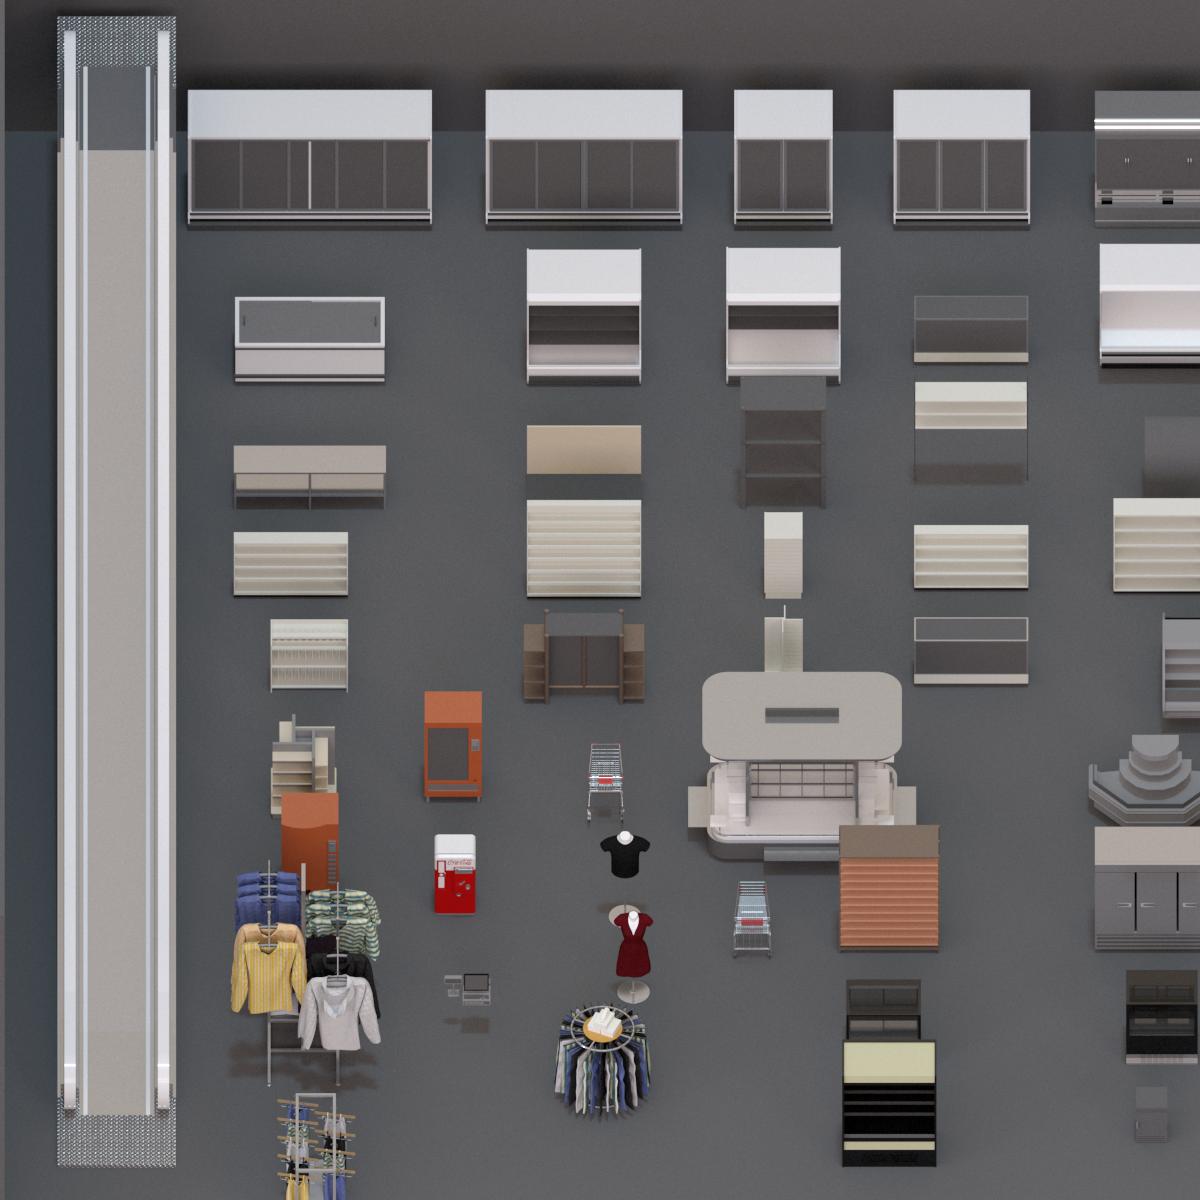 Colección Mobiliario Comercio en BIM